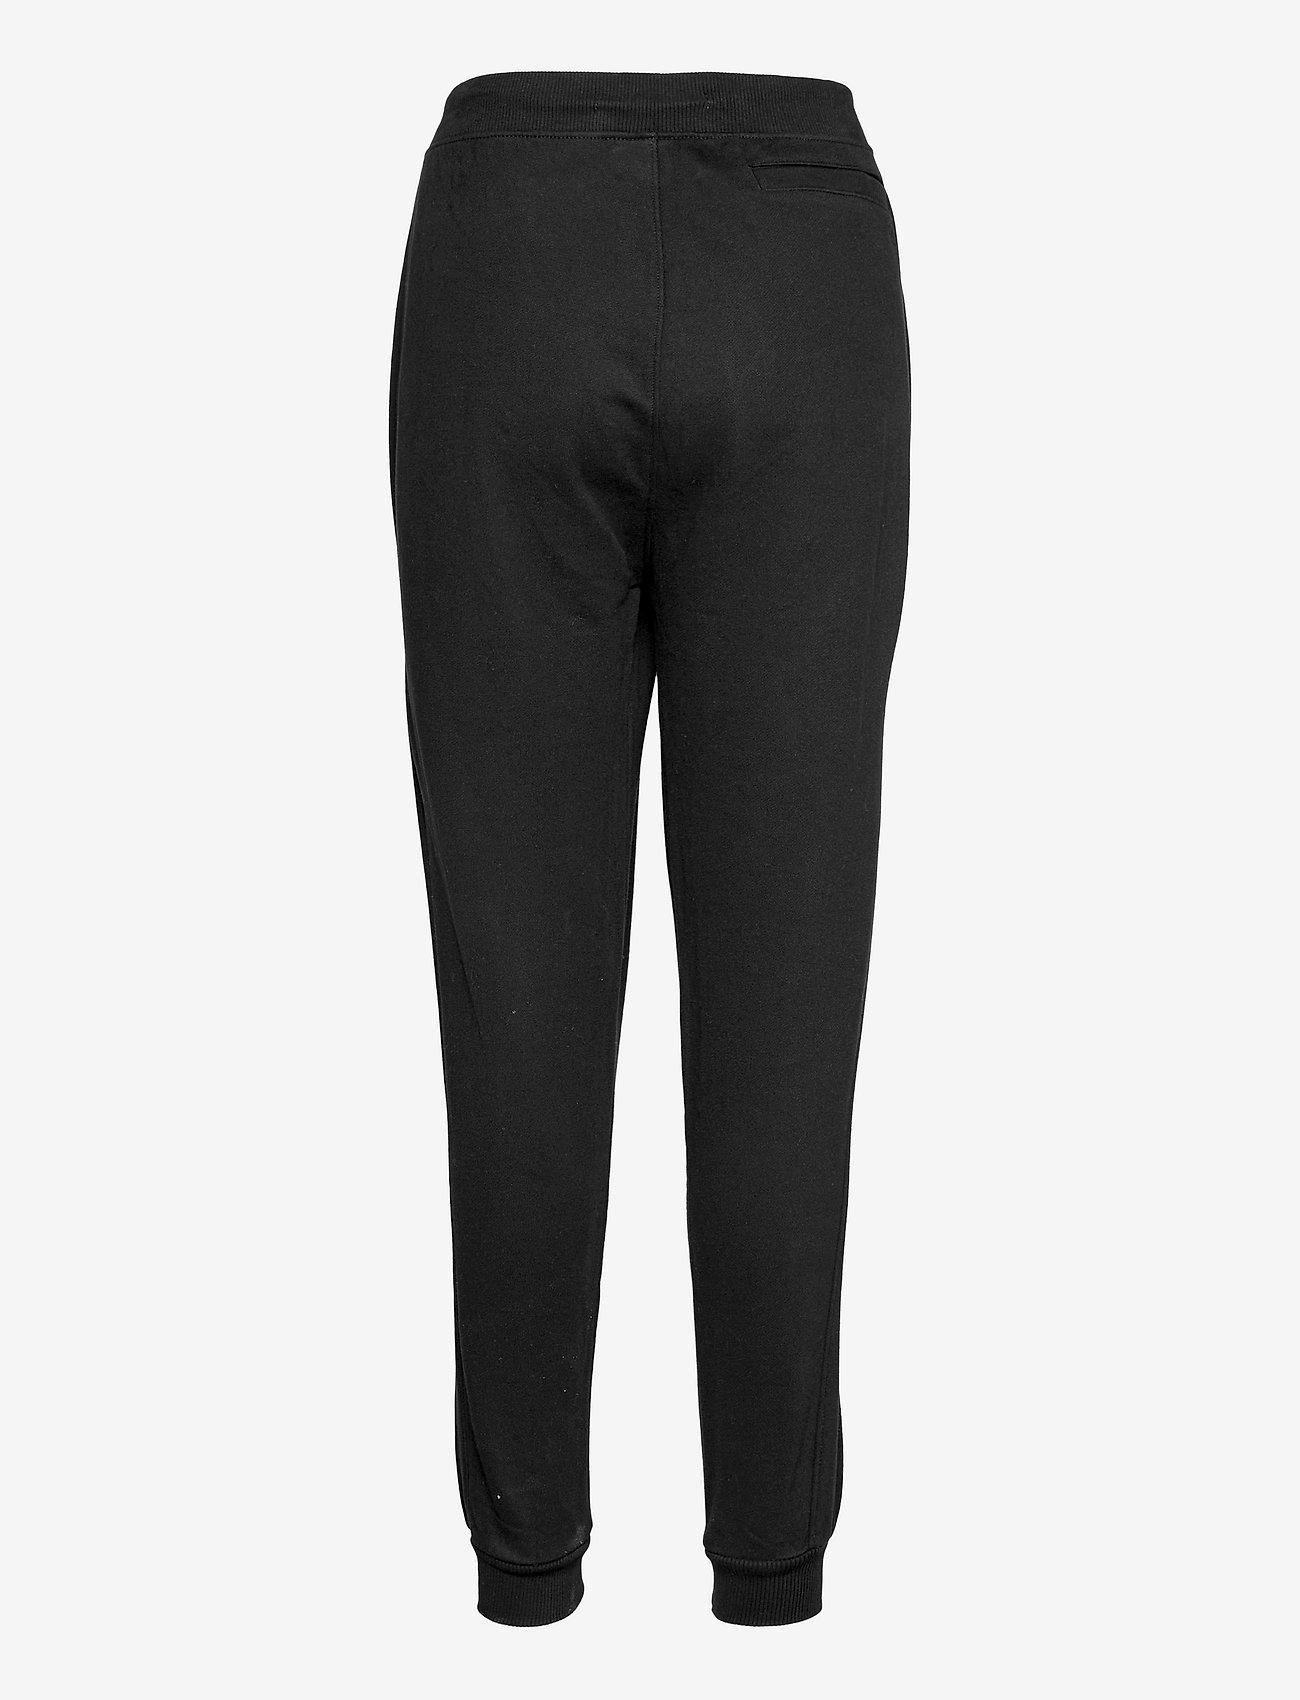 Calvin Klein Jeans - PLUS MICRO BRANDING JOGGING PANT - tøj - ck black - 1